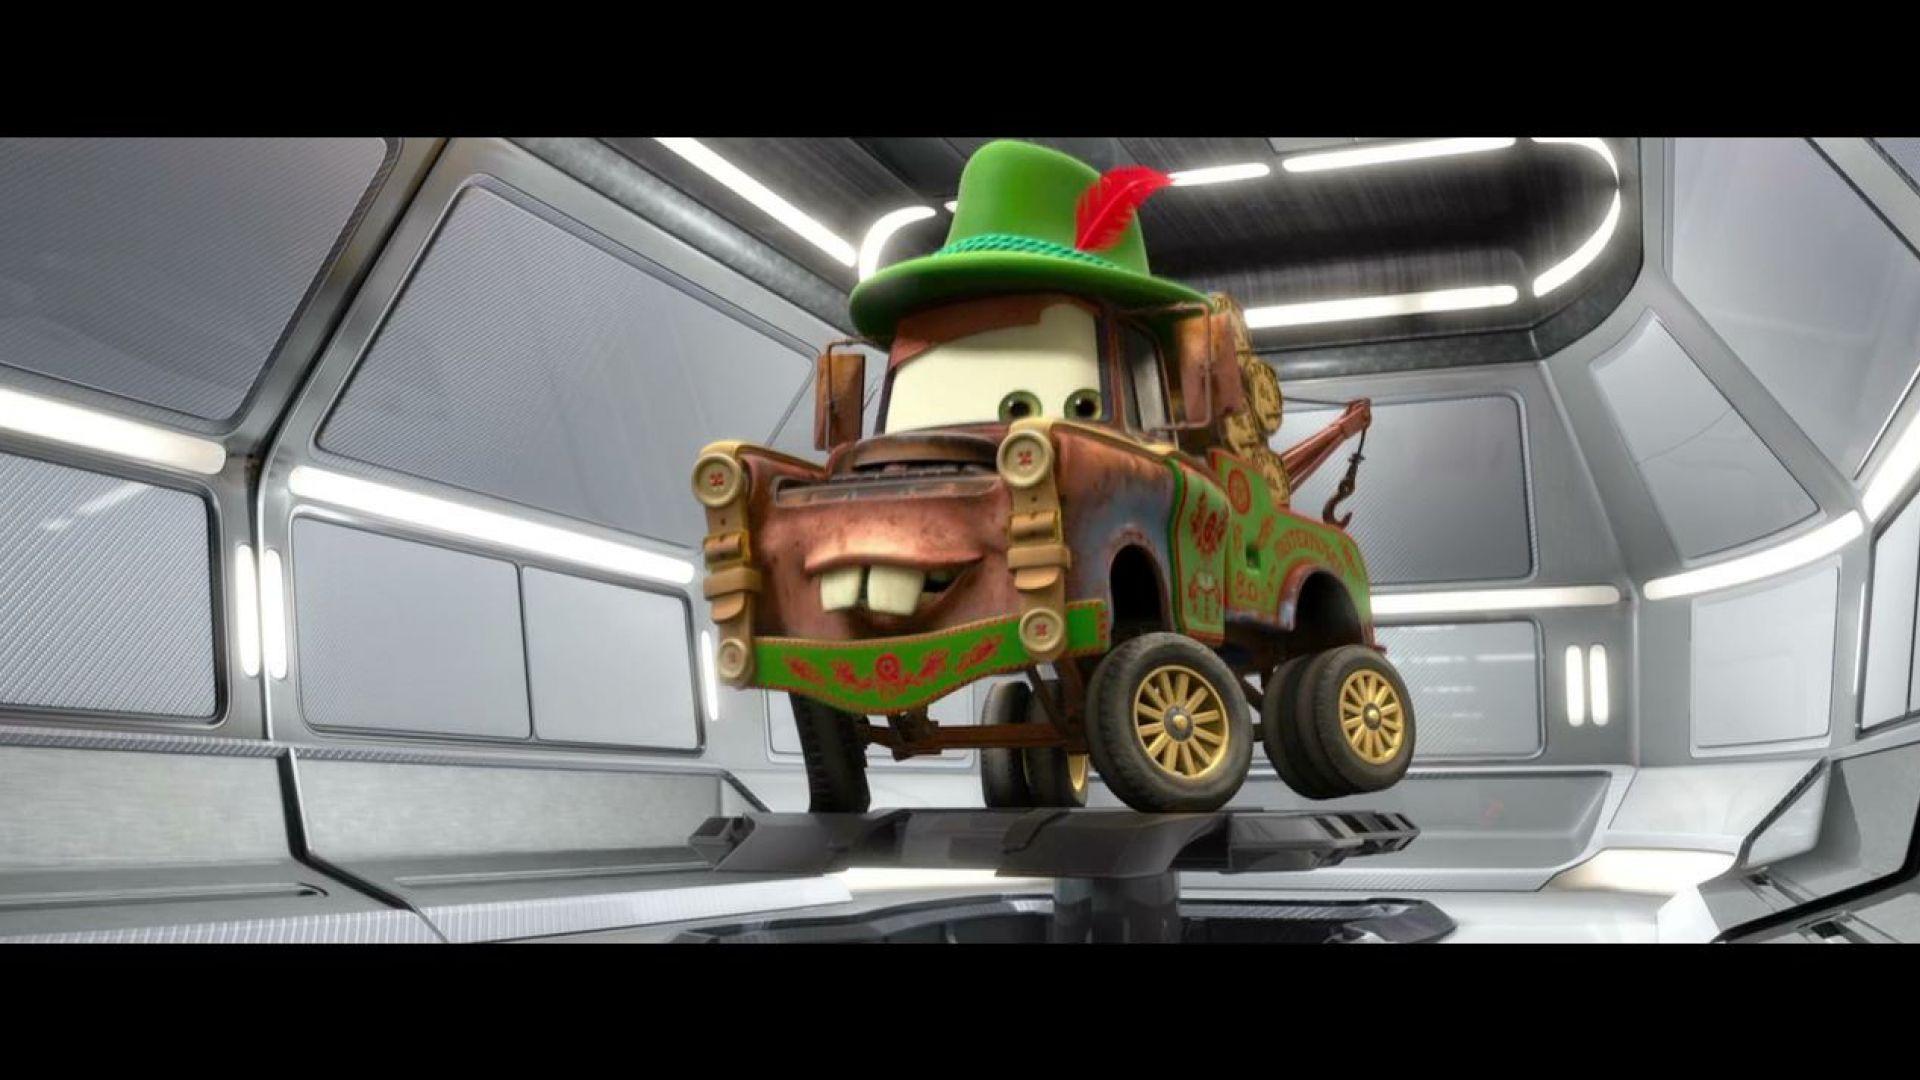 Disguise program initiated. Mater wearing Materhosen, Cars 2